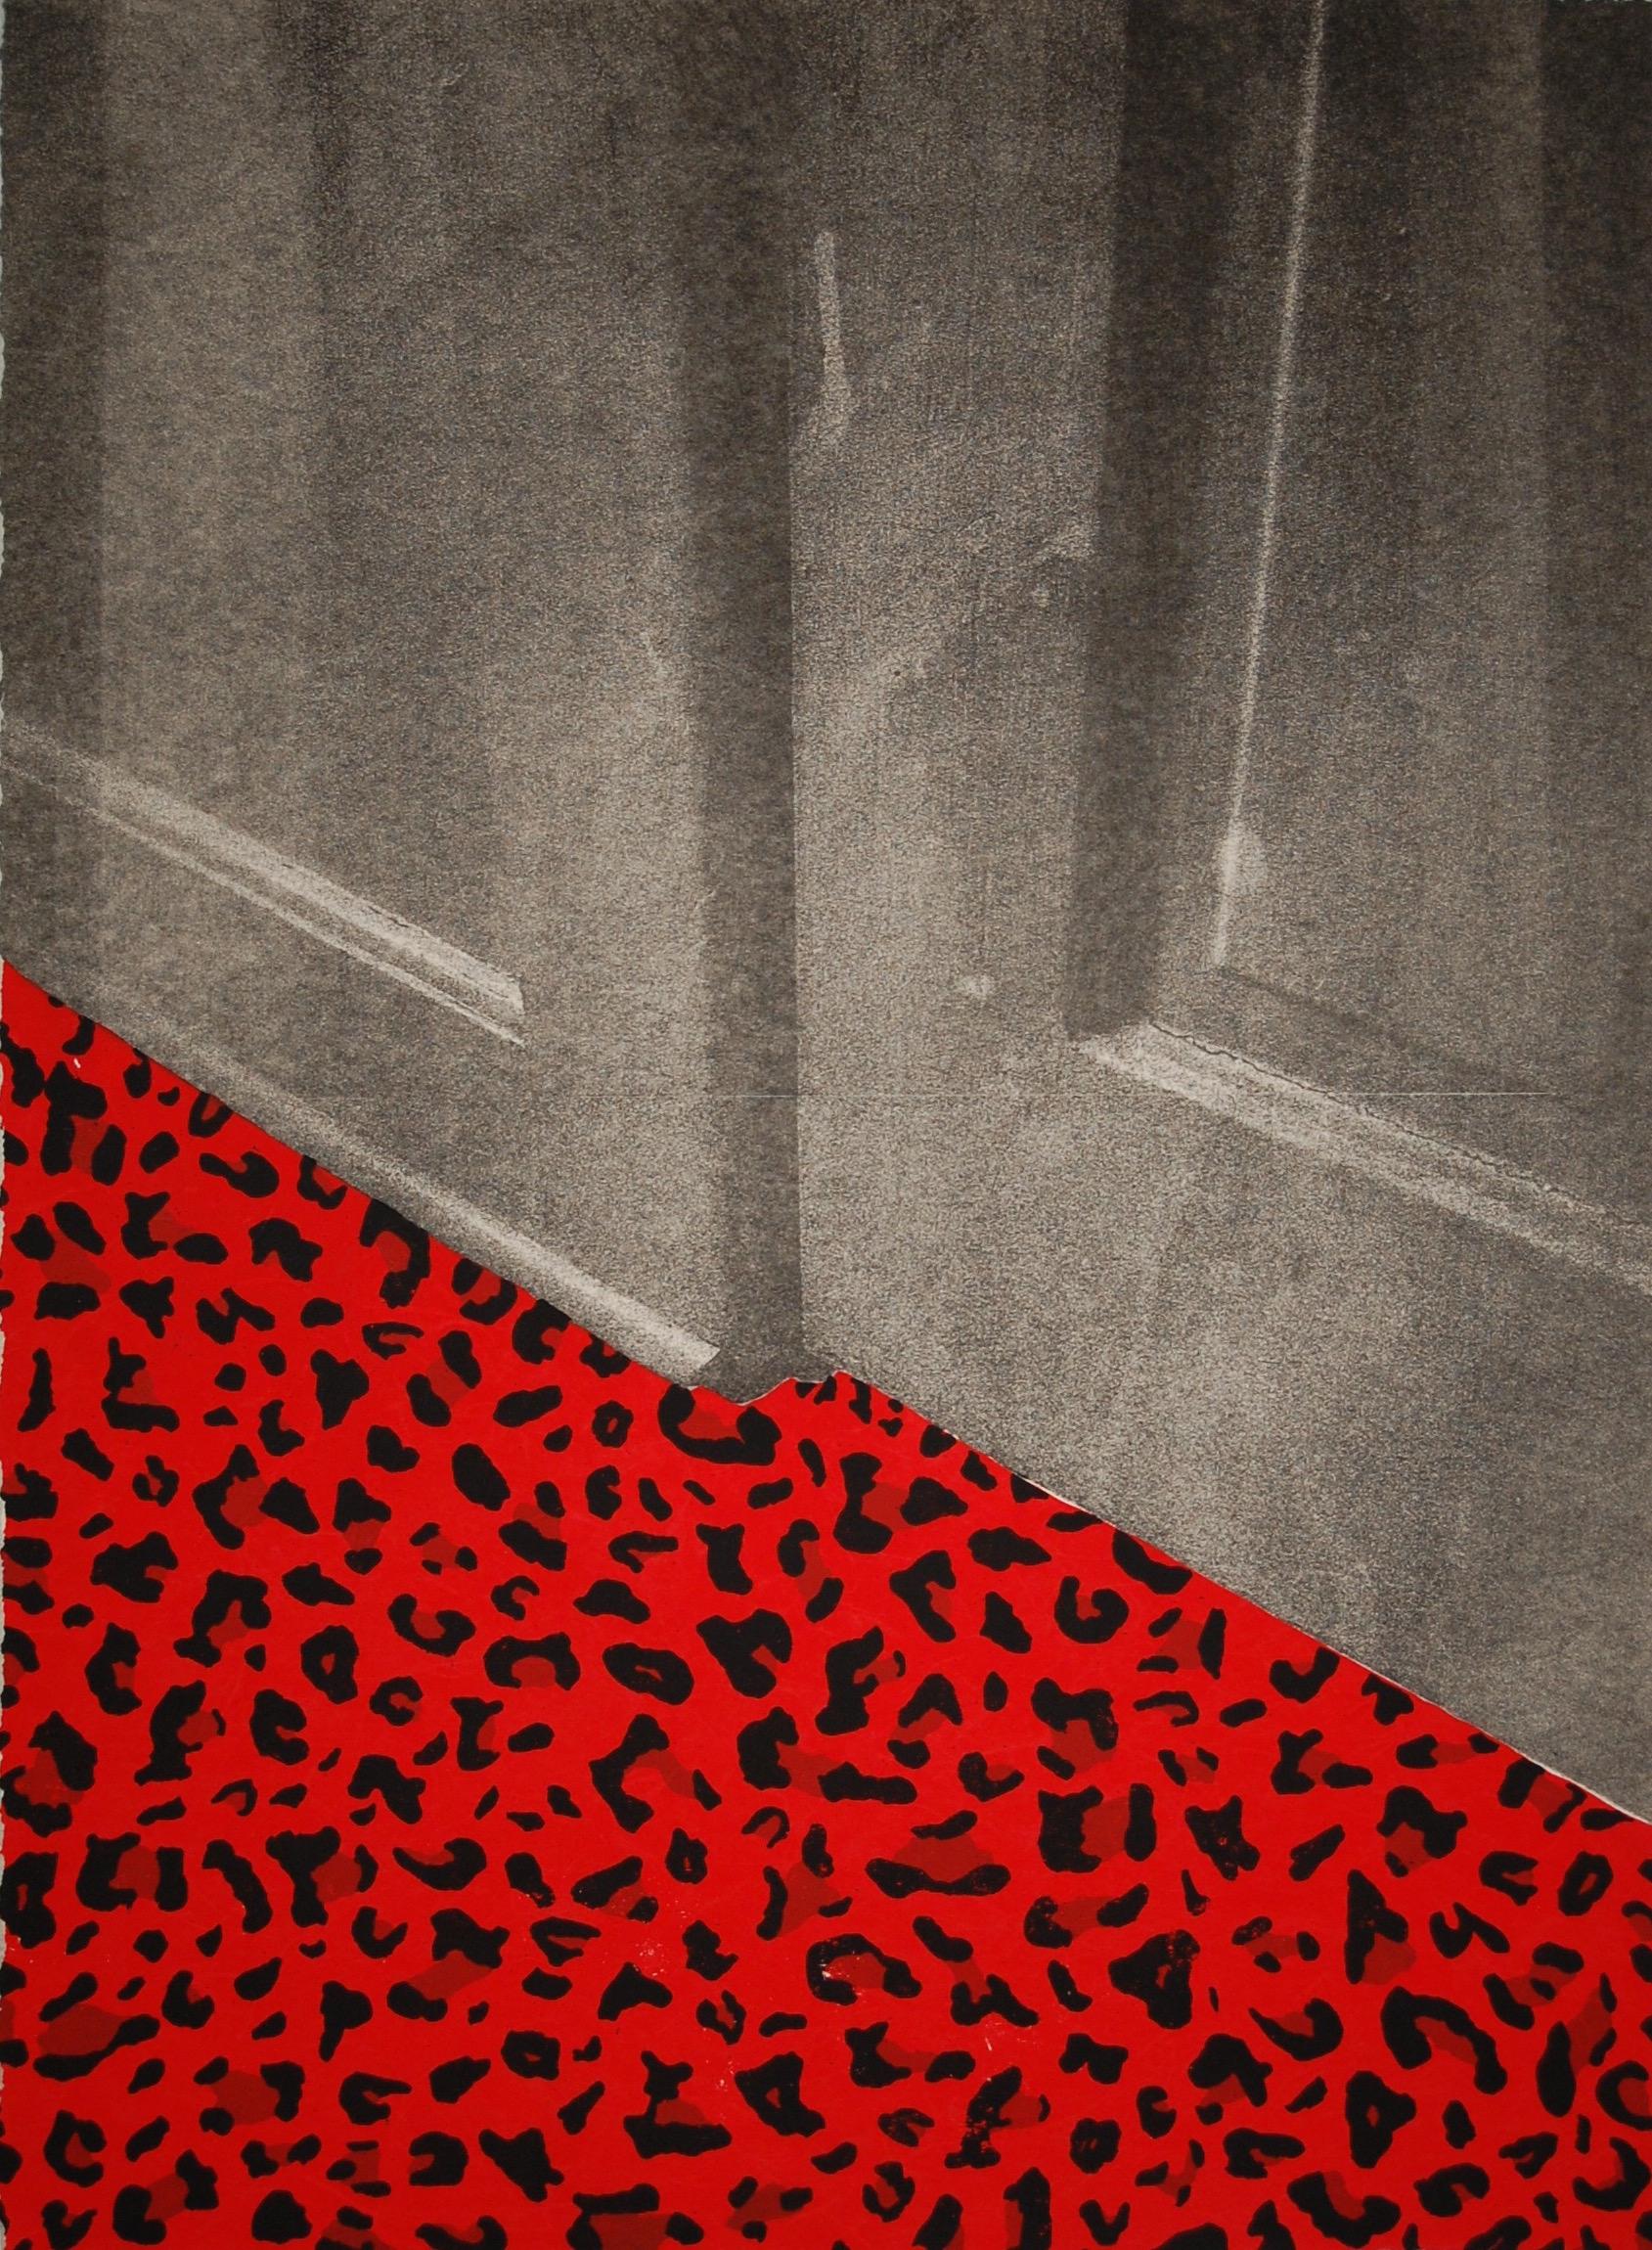 Apartment Hallway: The Red Leopard Carpet